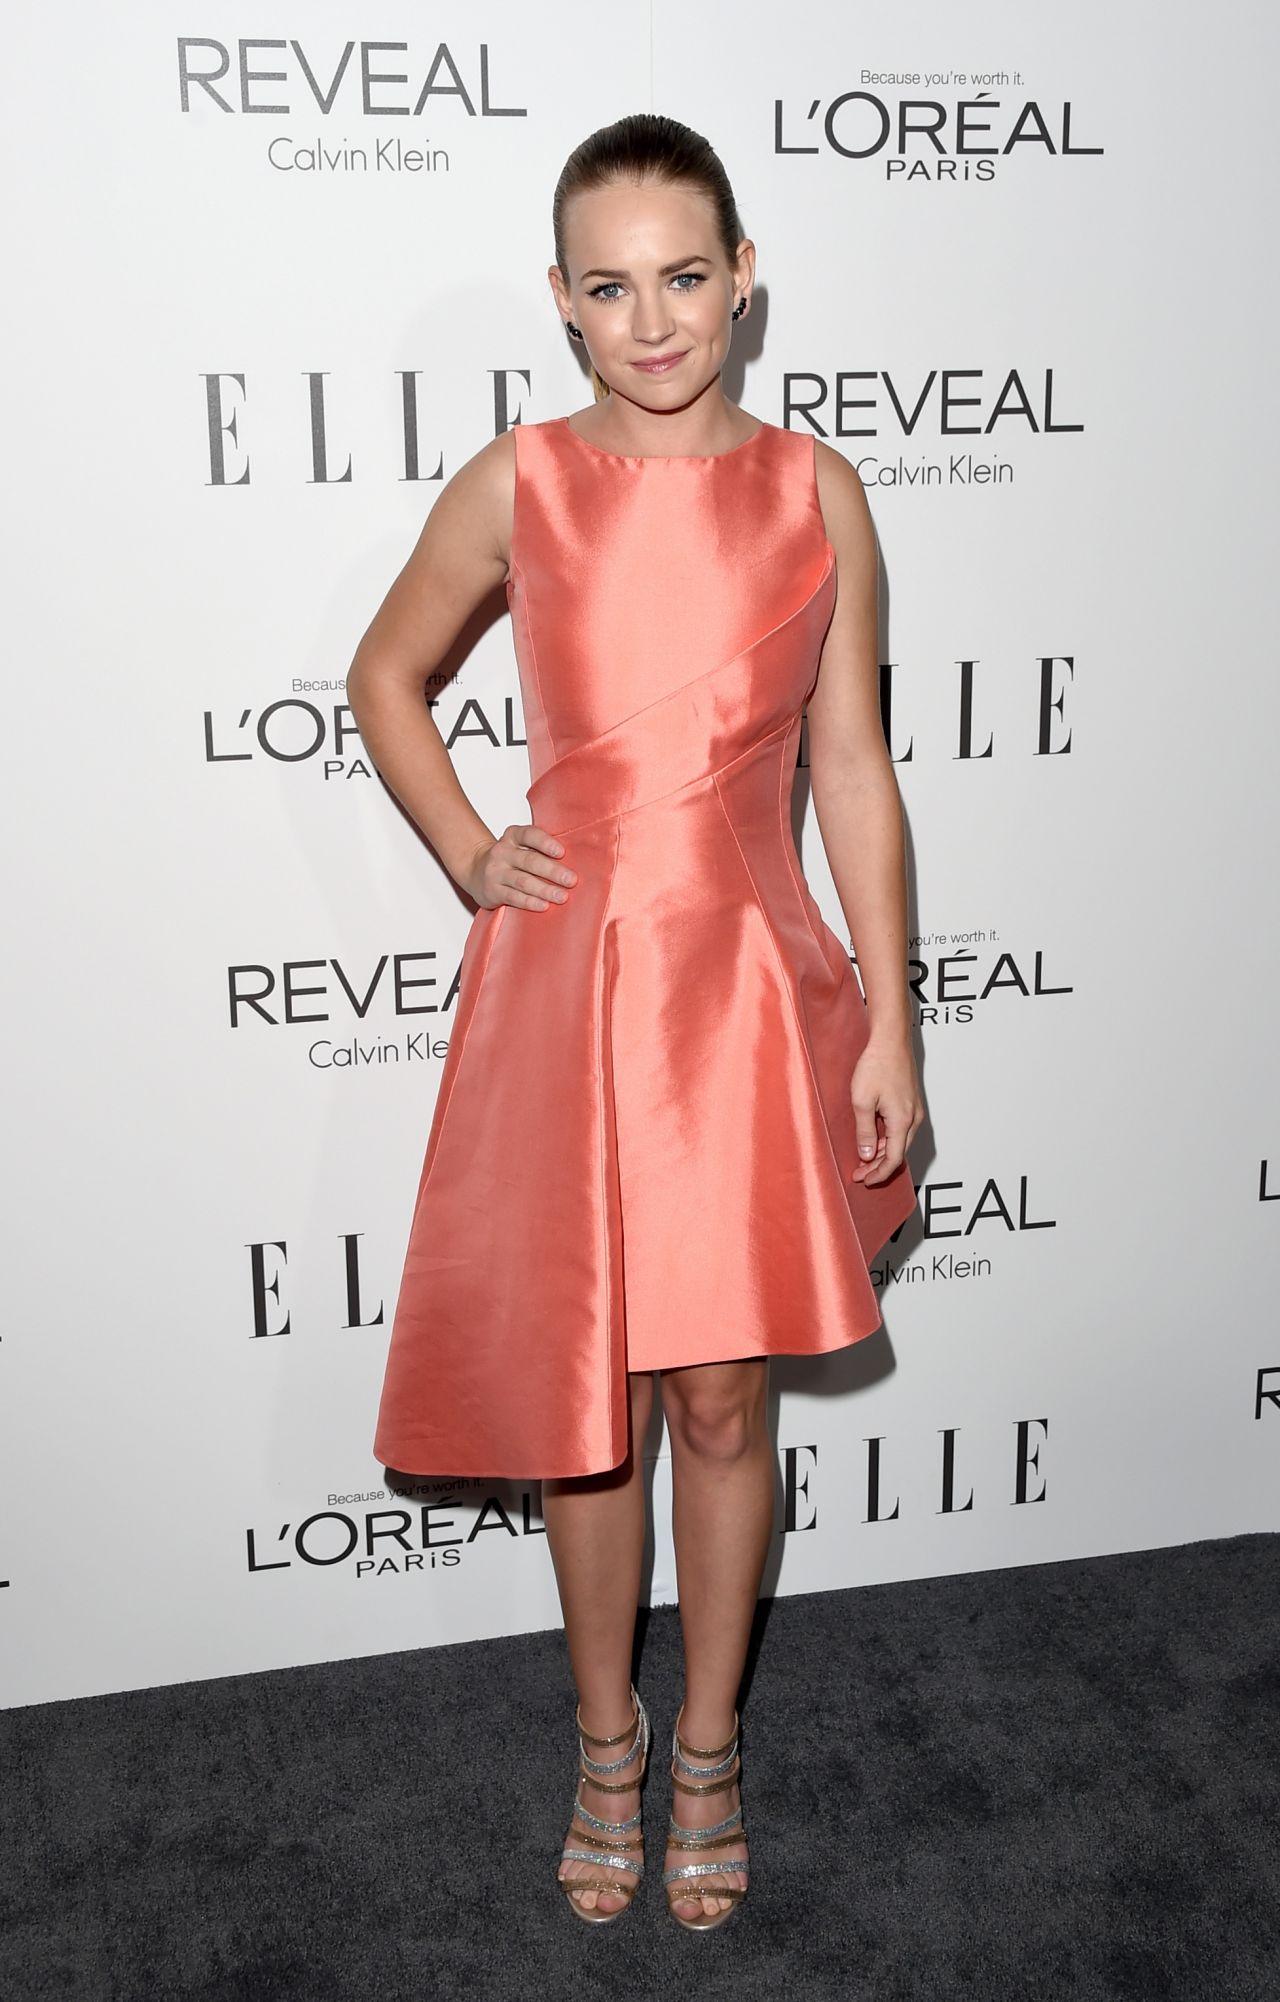 britt-robertson-elle-s-2014-women-in-hollywood-awards-in-los-angeles_7